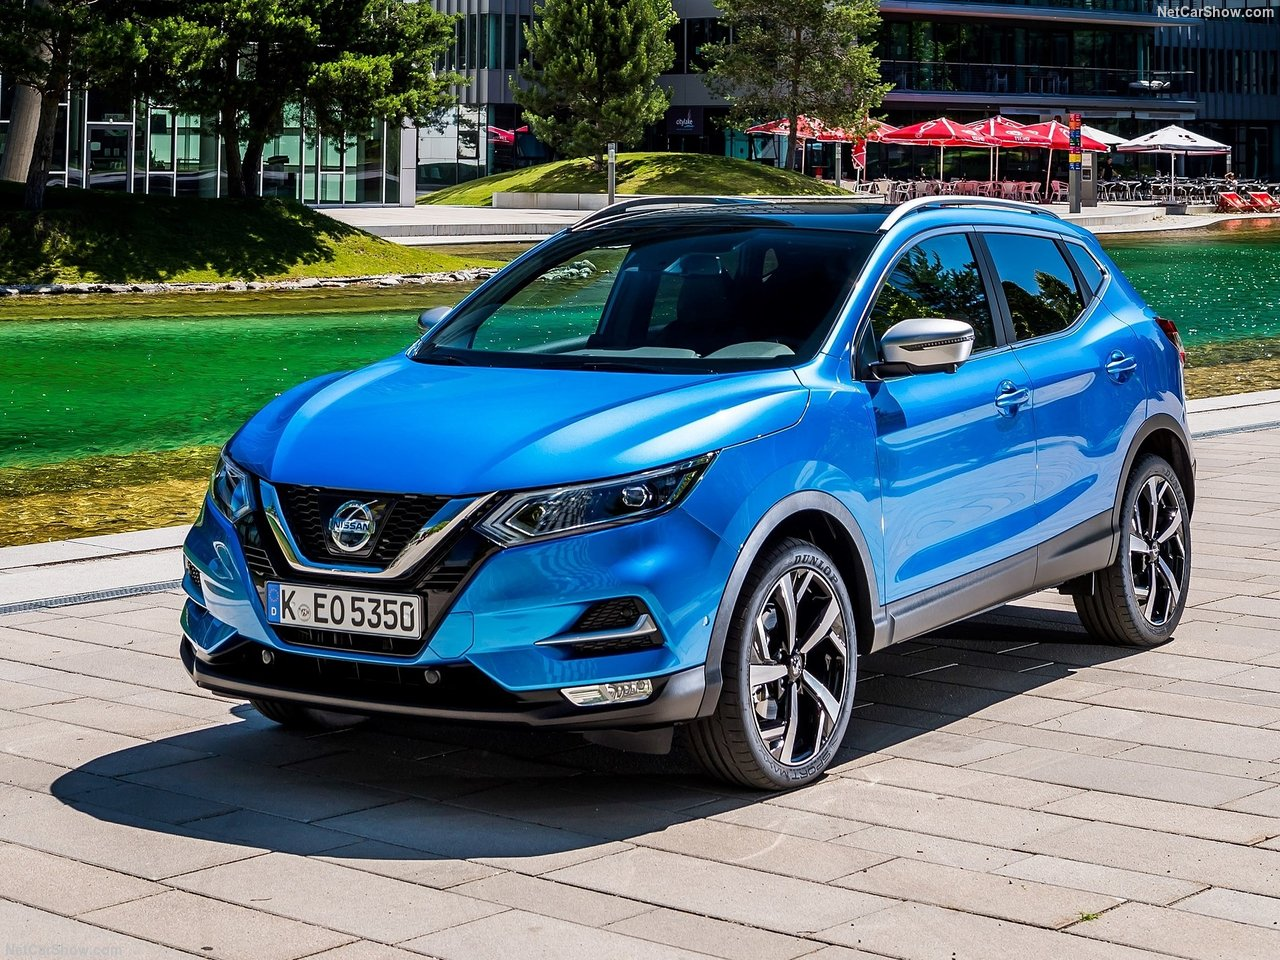 Nissan Qashqai 2017 Külső 1.